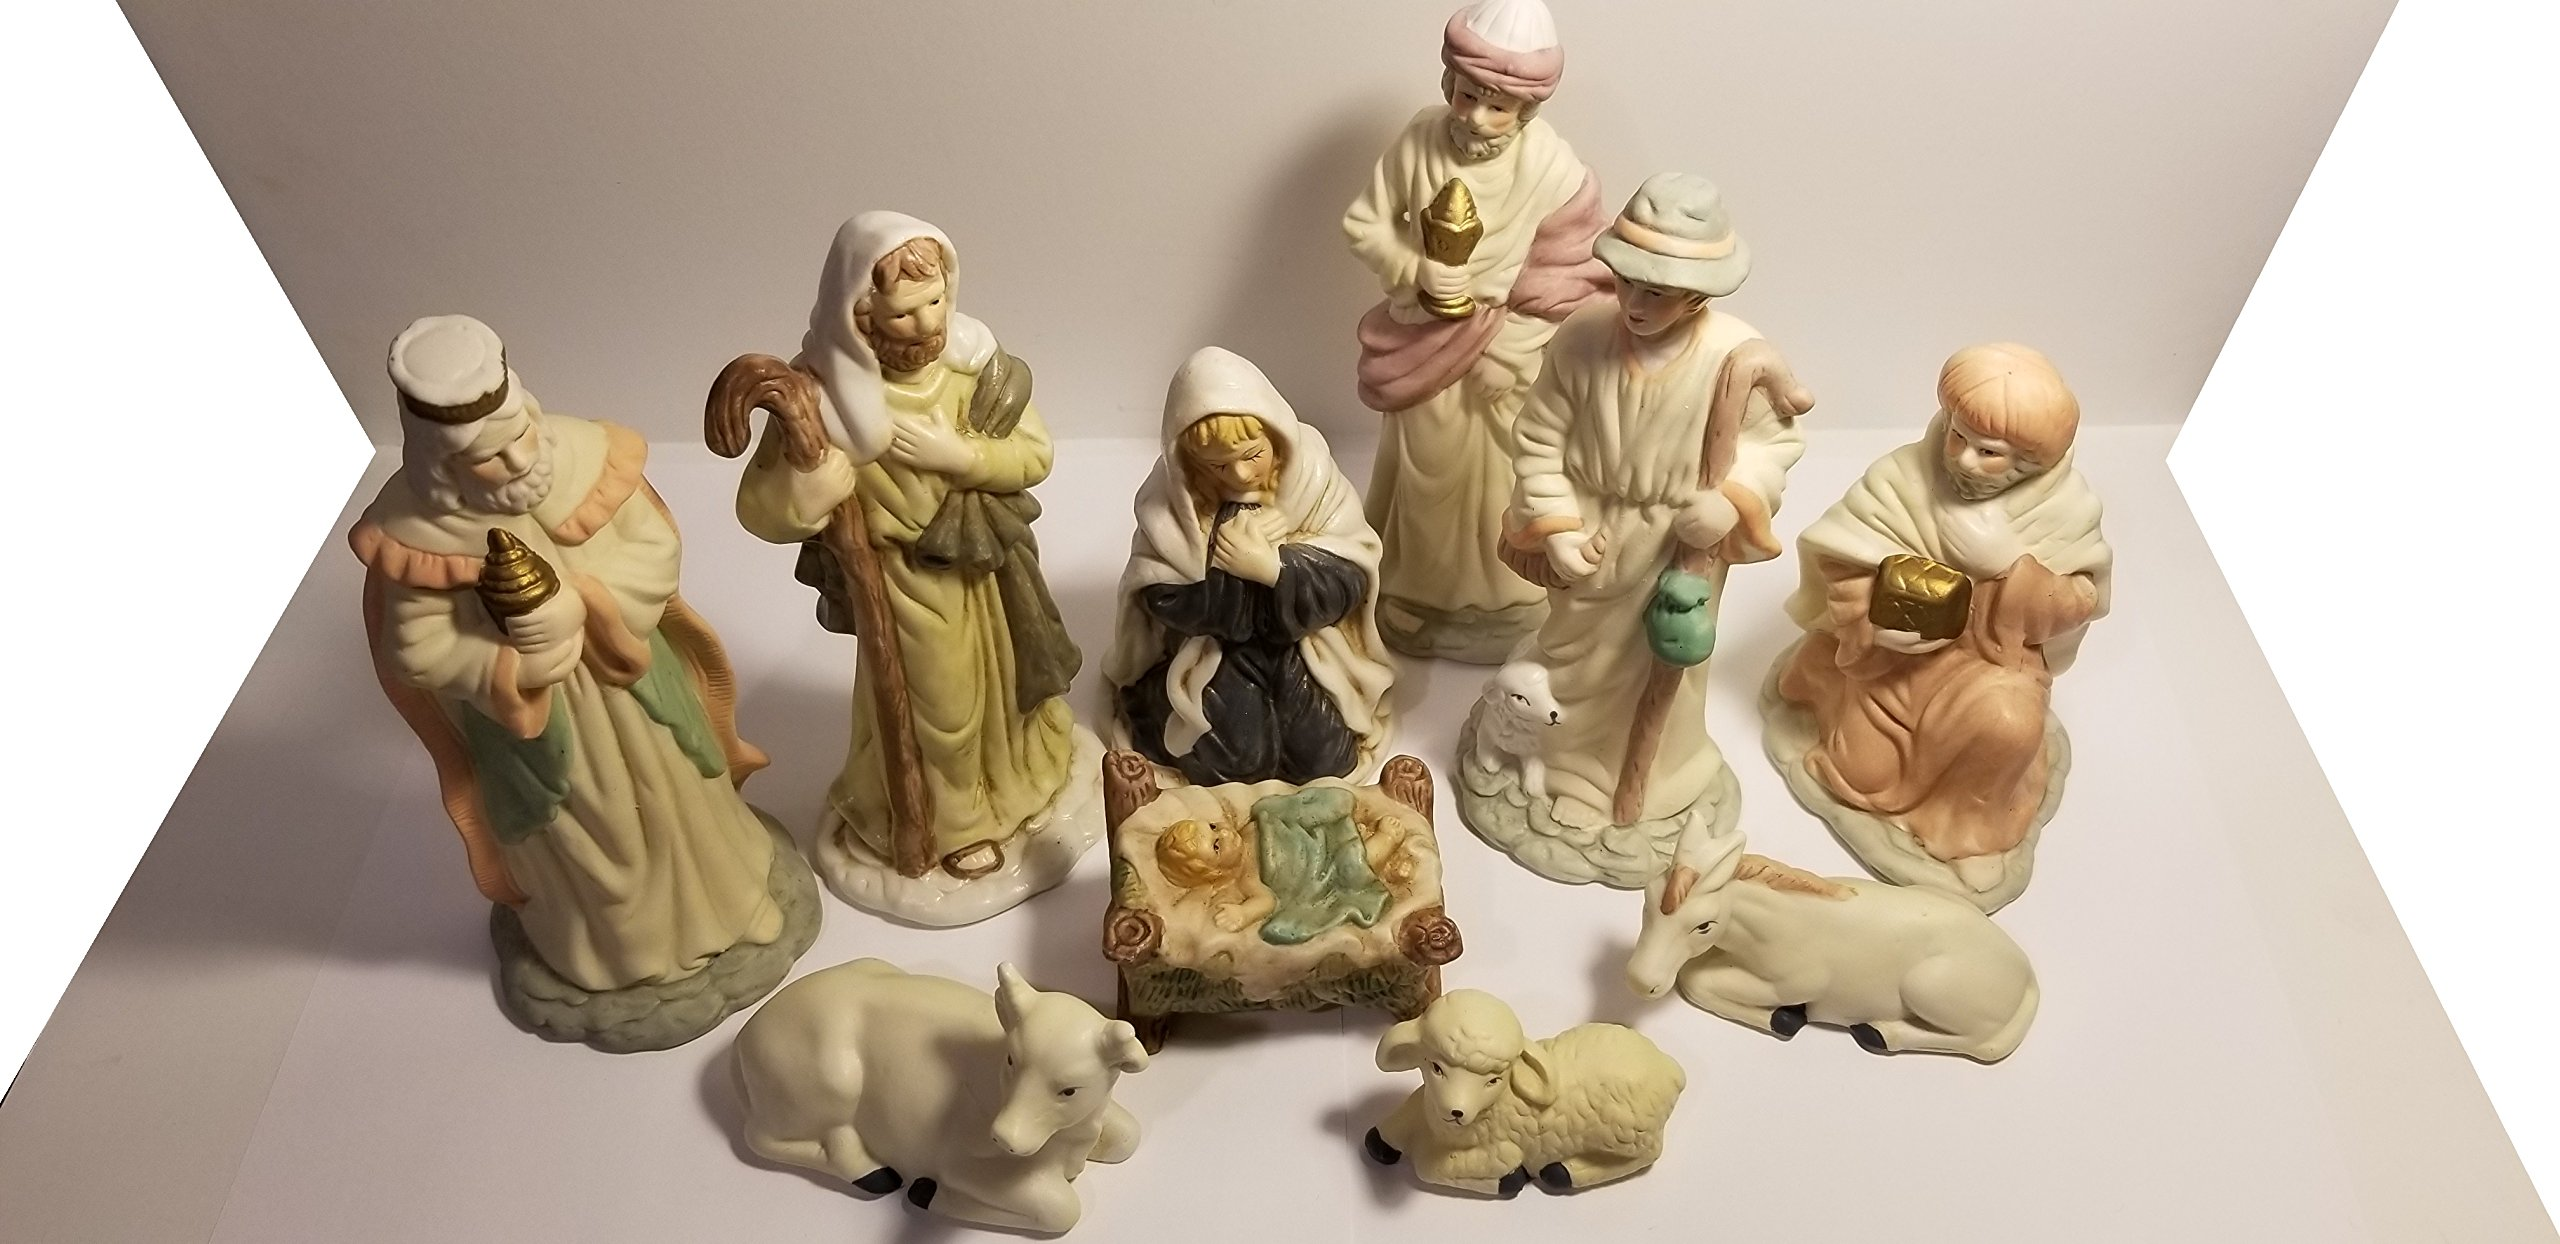 Frank's Nursery & Crafts Nativity Set with 10 Porcelain Figures